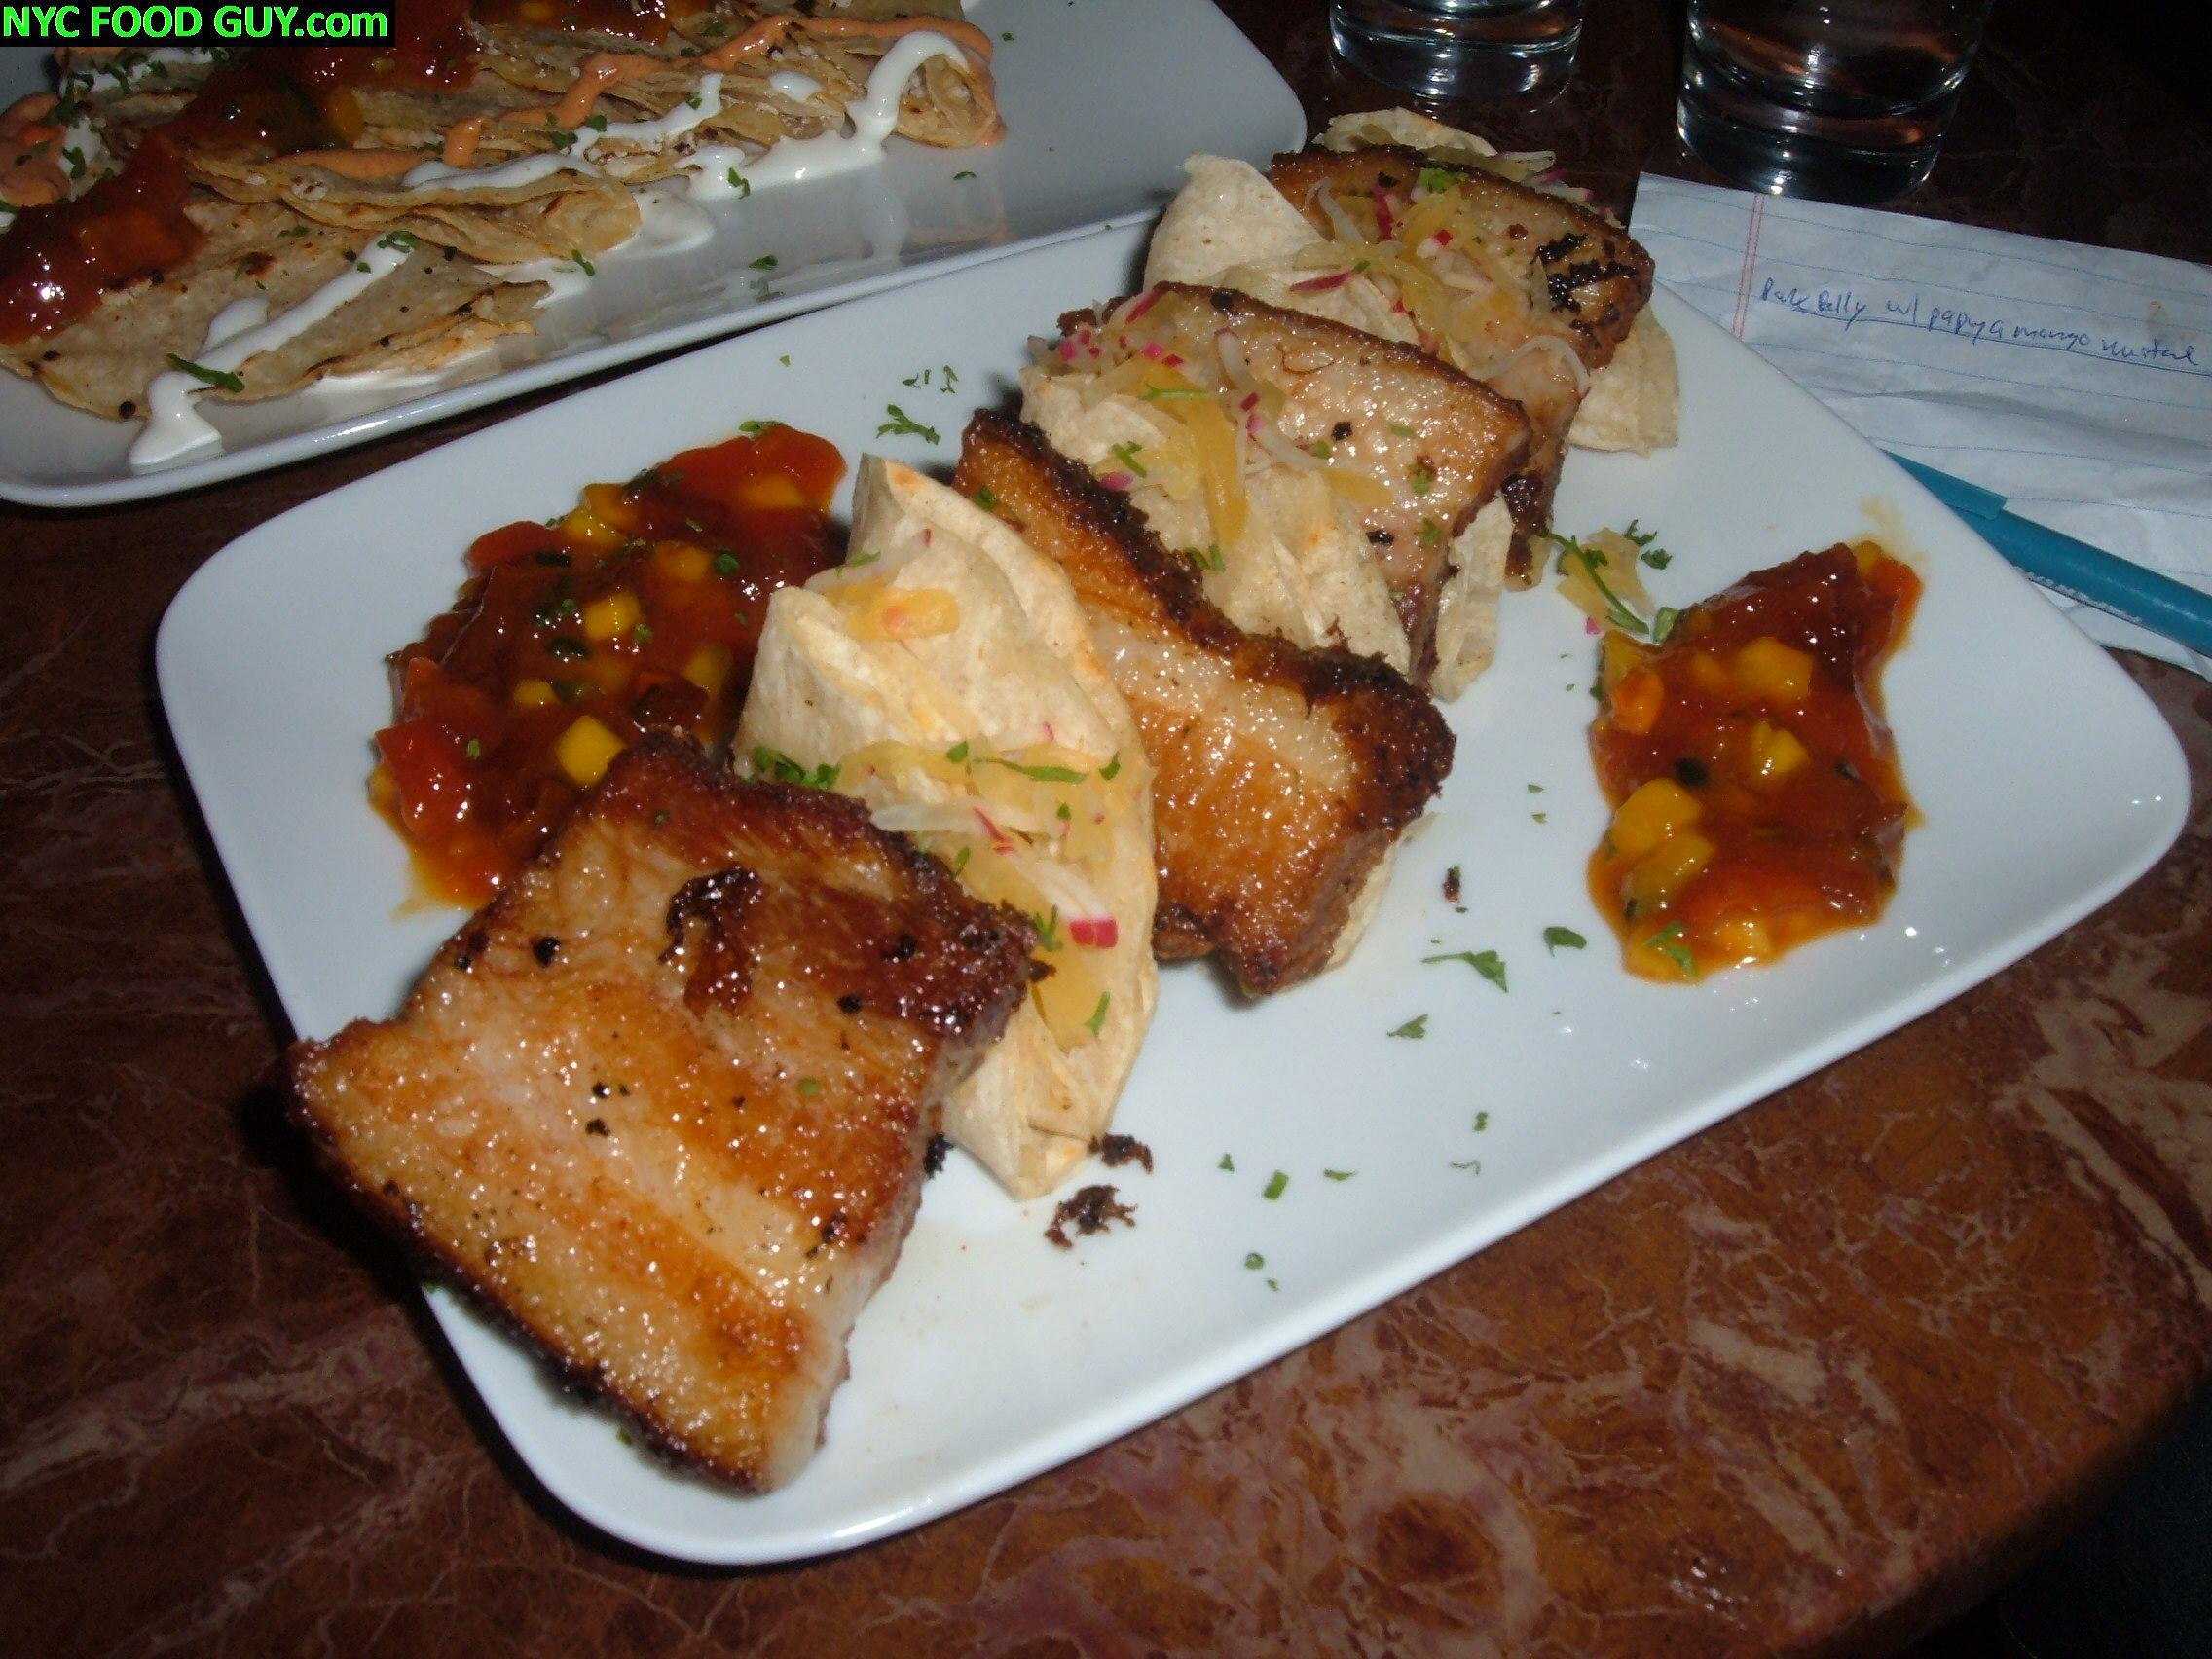 Braised Pork Belly with Papaya Mango Mustard ($10)